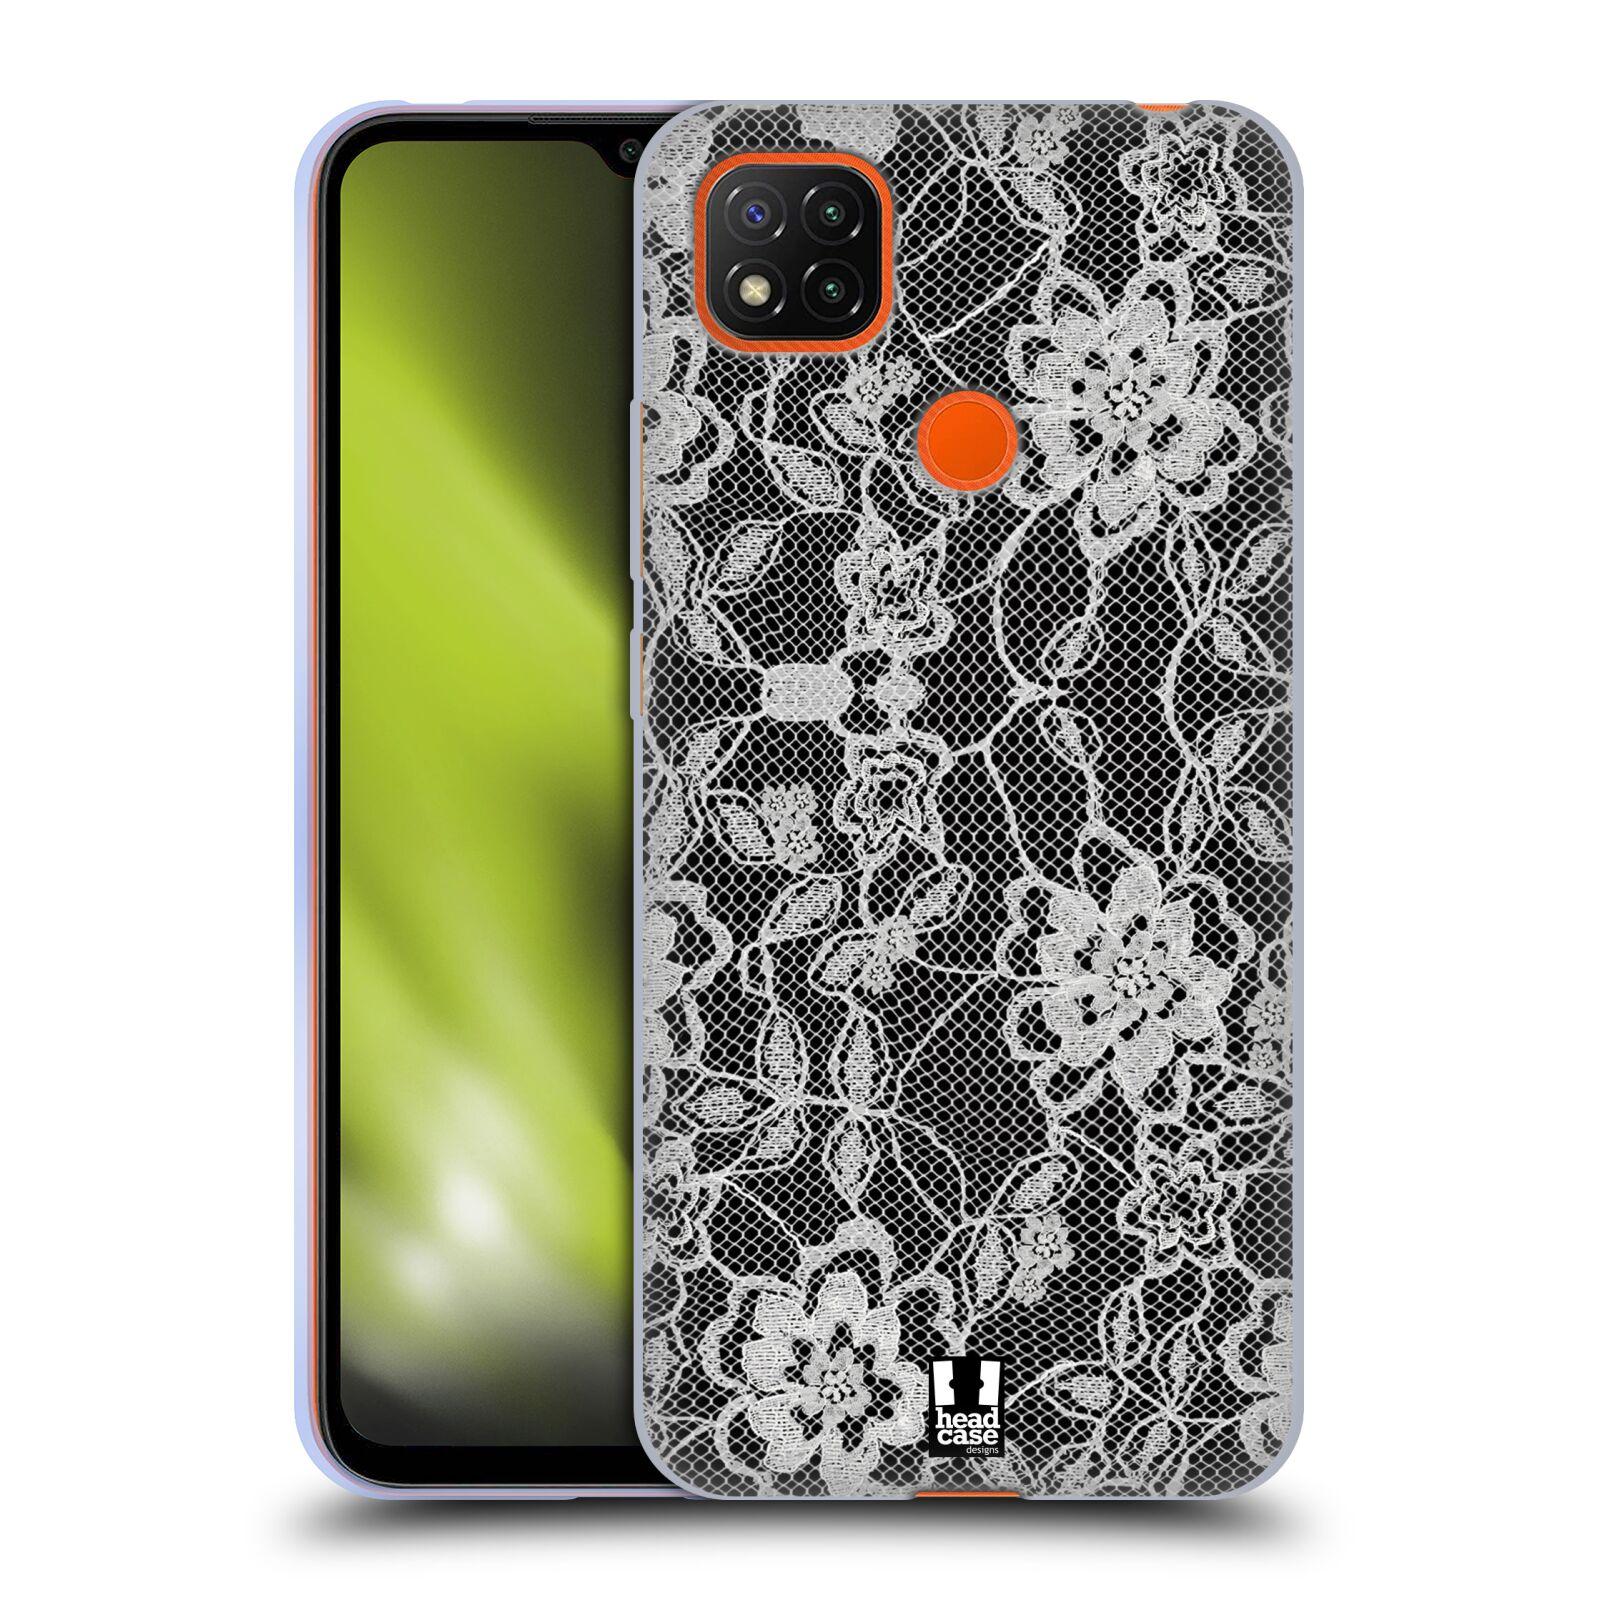 Silikonové pouzdro na mobil Xiaomi Redmi 9C - Head Case - FLOWERY KRAJKA